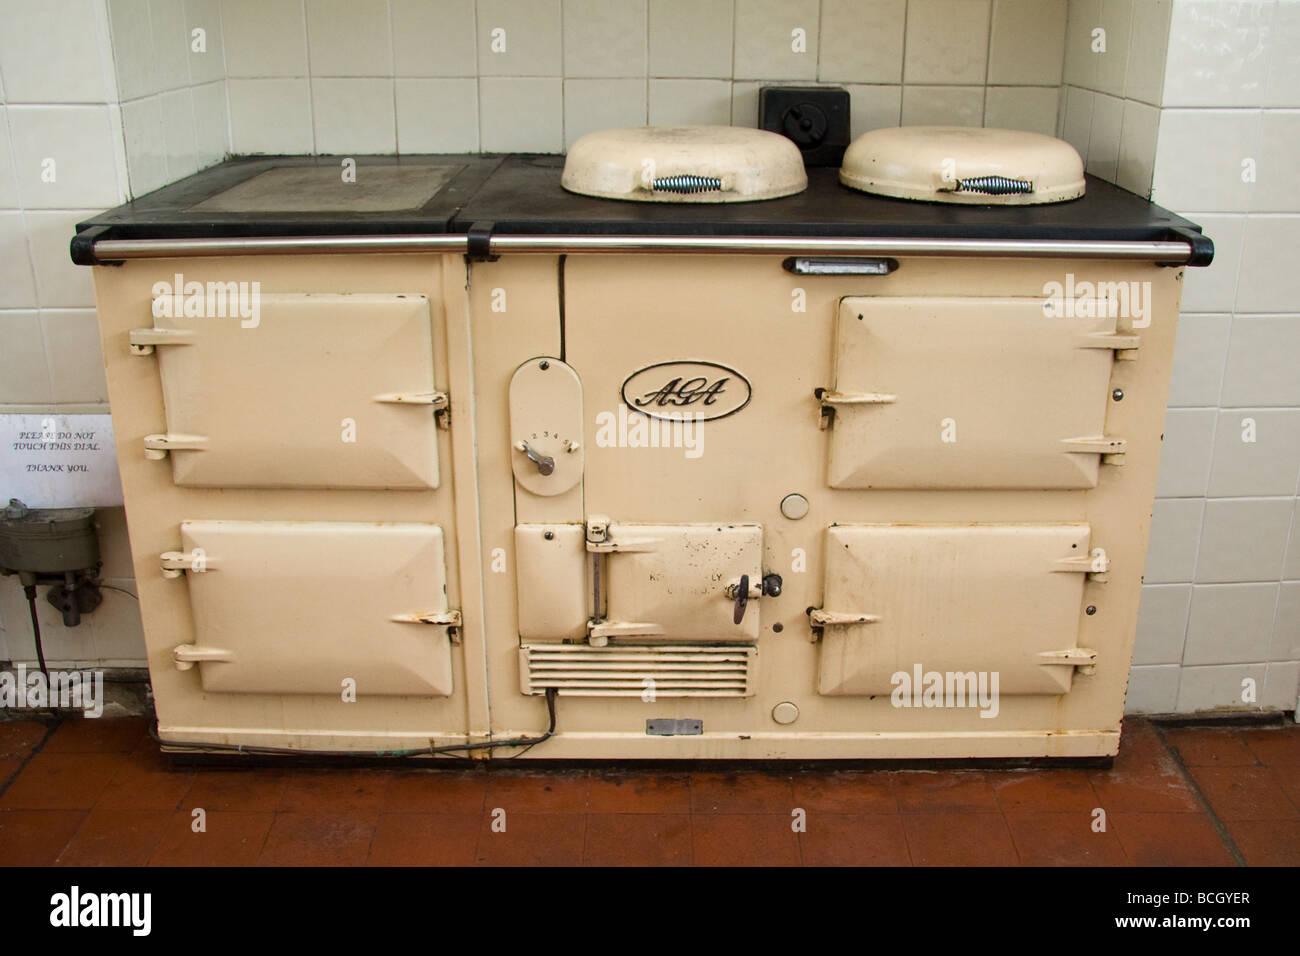 4 oven AGA cooker Stock Photo: 24959055 - Alamy